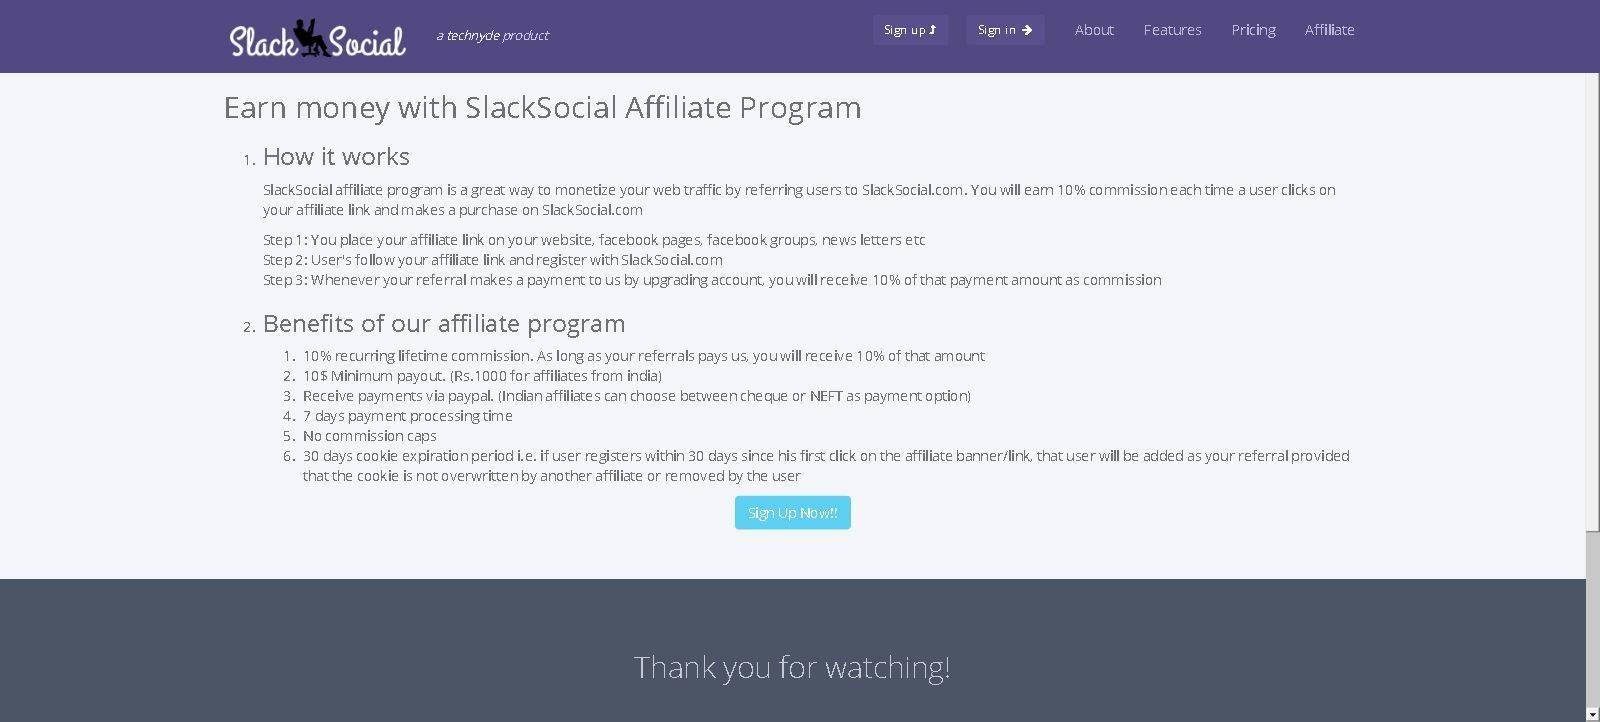 Gallery - SlackSocial Review